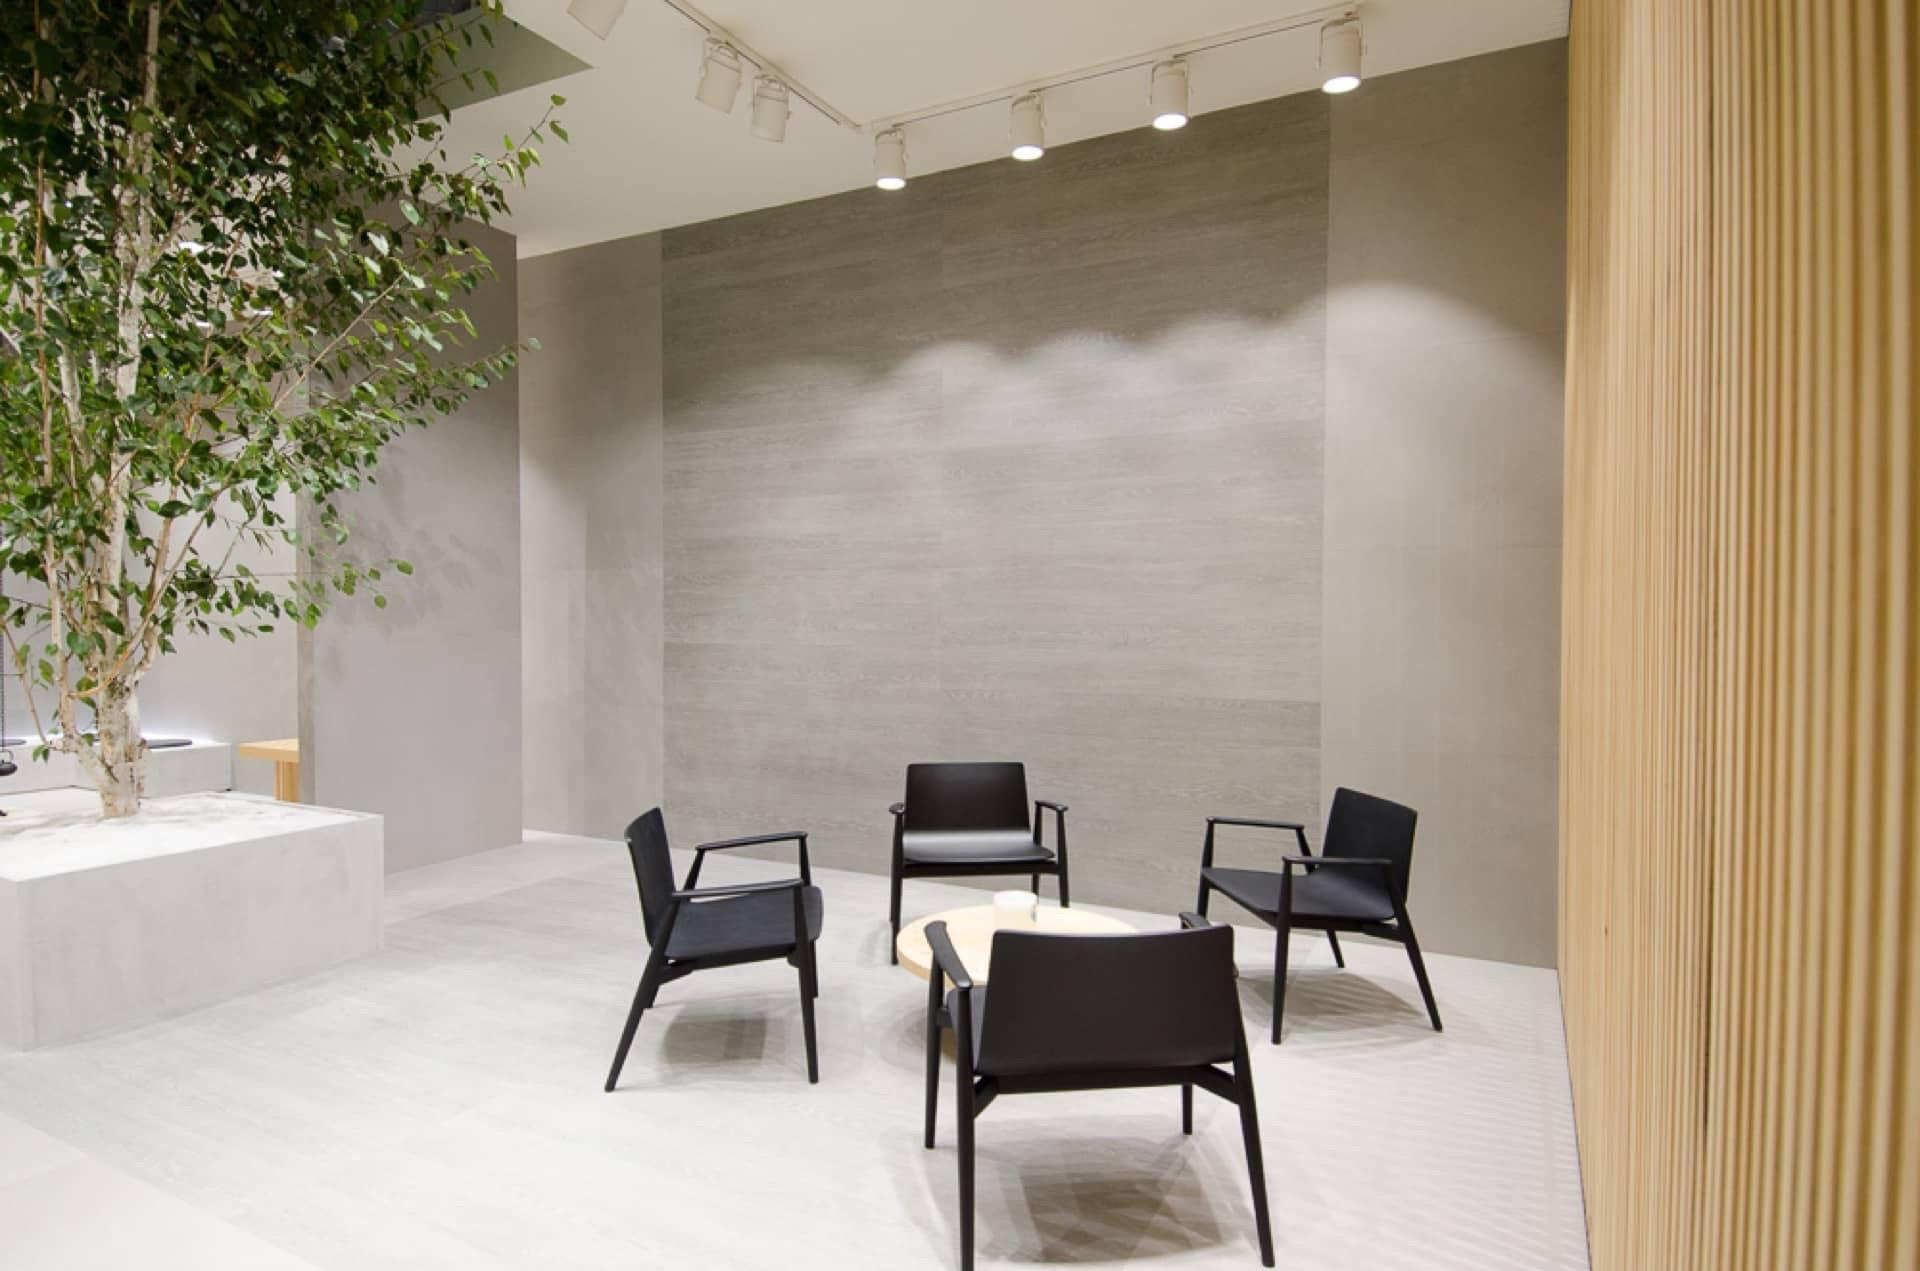 Tr3nd_FashionWood_Smoke_20x180_Concrete_grey_80x120_1